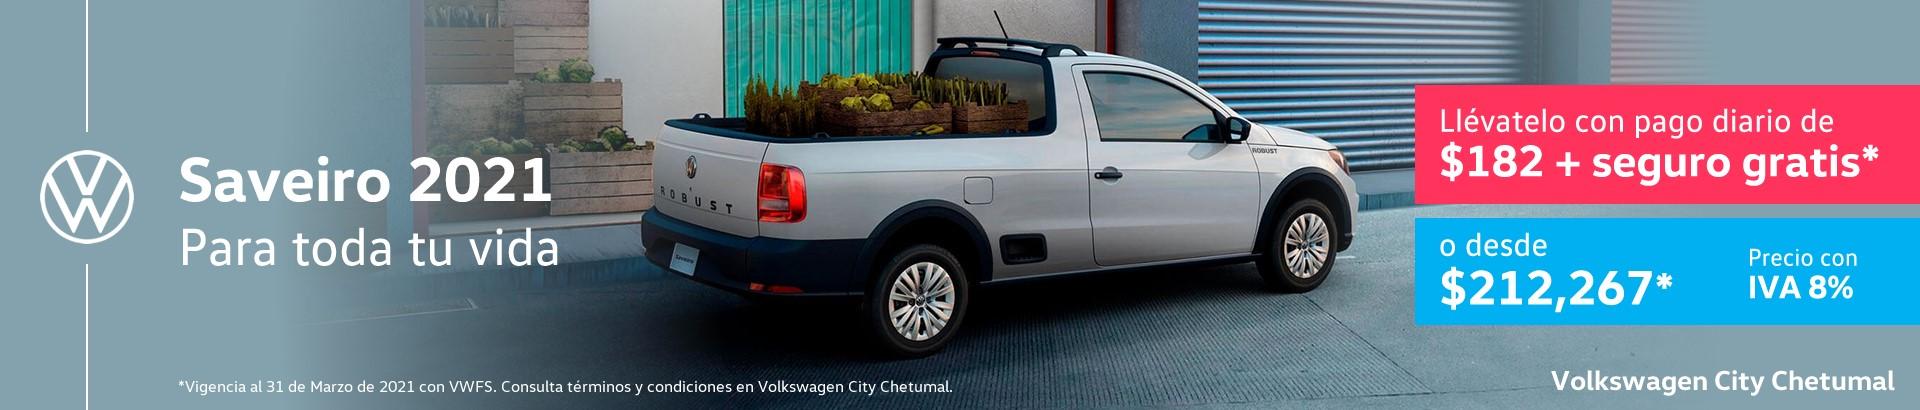 Volkswagen Autosur Chetumal